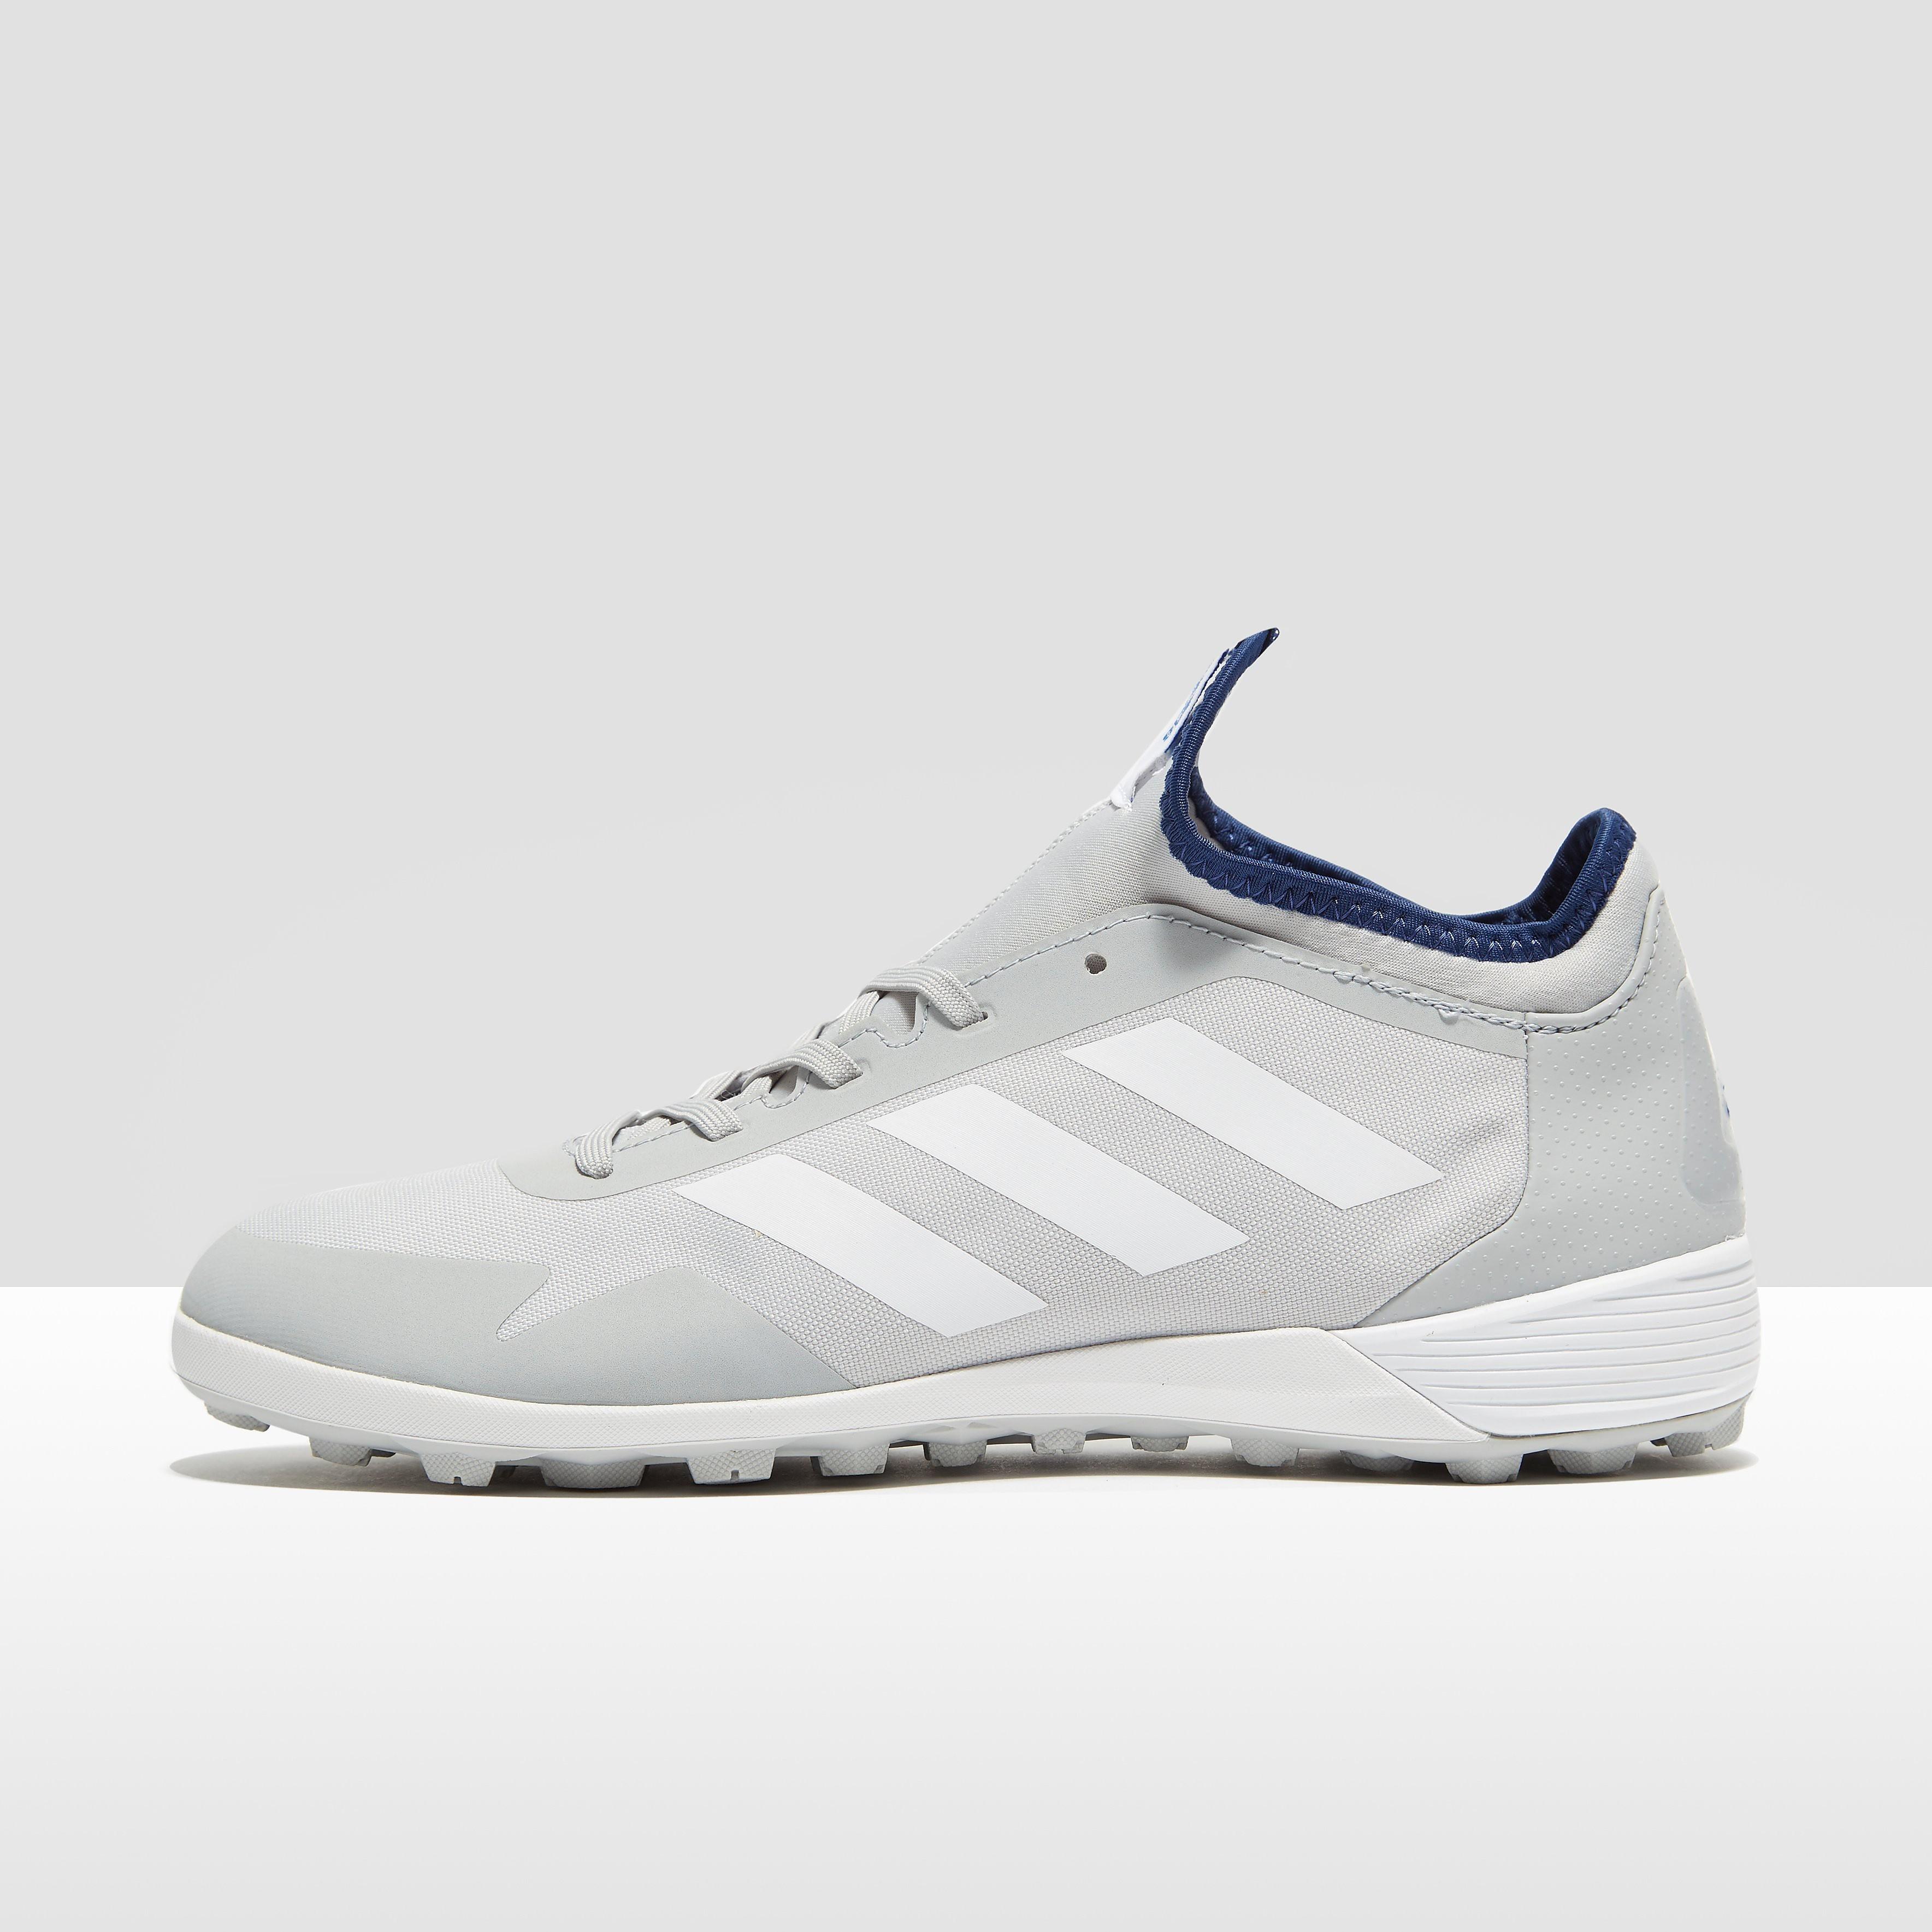 adidas Blue Blast ACE Tango 17.2 Turf Men's Football Boots